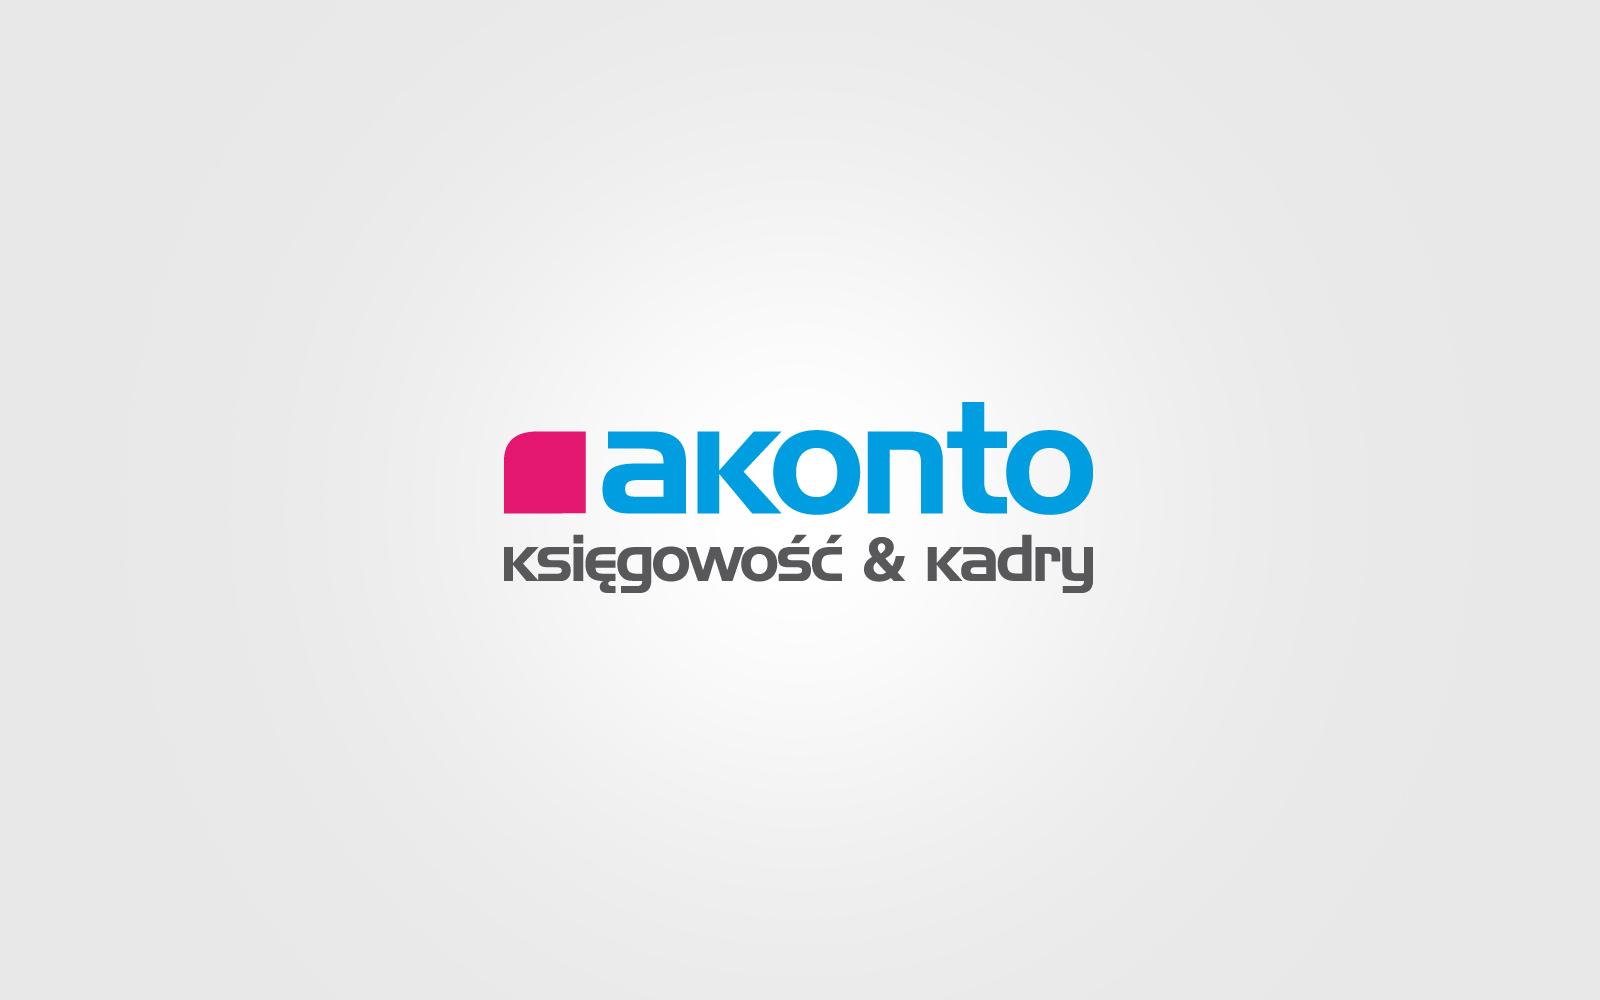 Akonto logo firmowe agencja brandingowa moweli creative